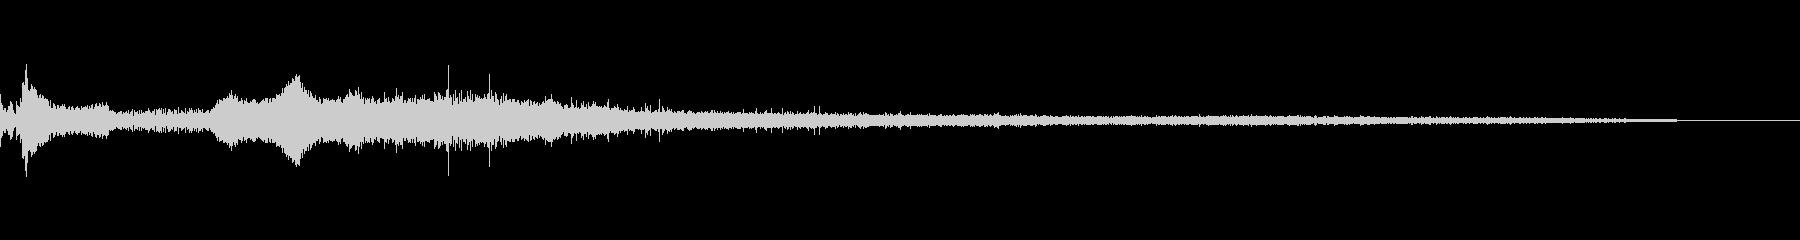 SKODA OCTAVIA 1.6...の未再生の波形